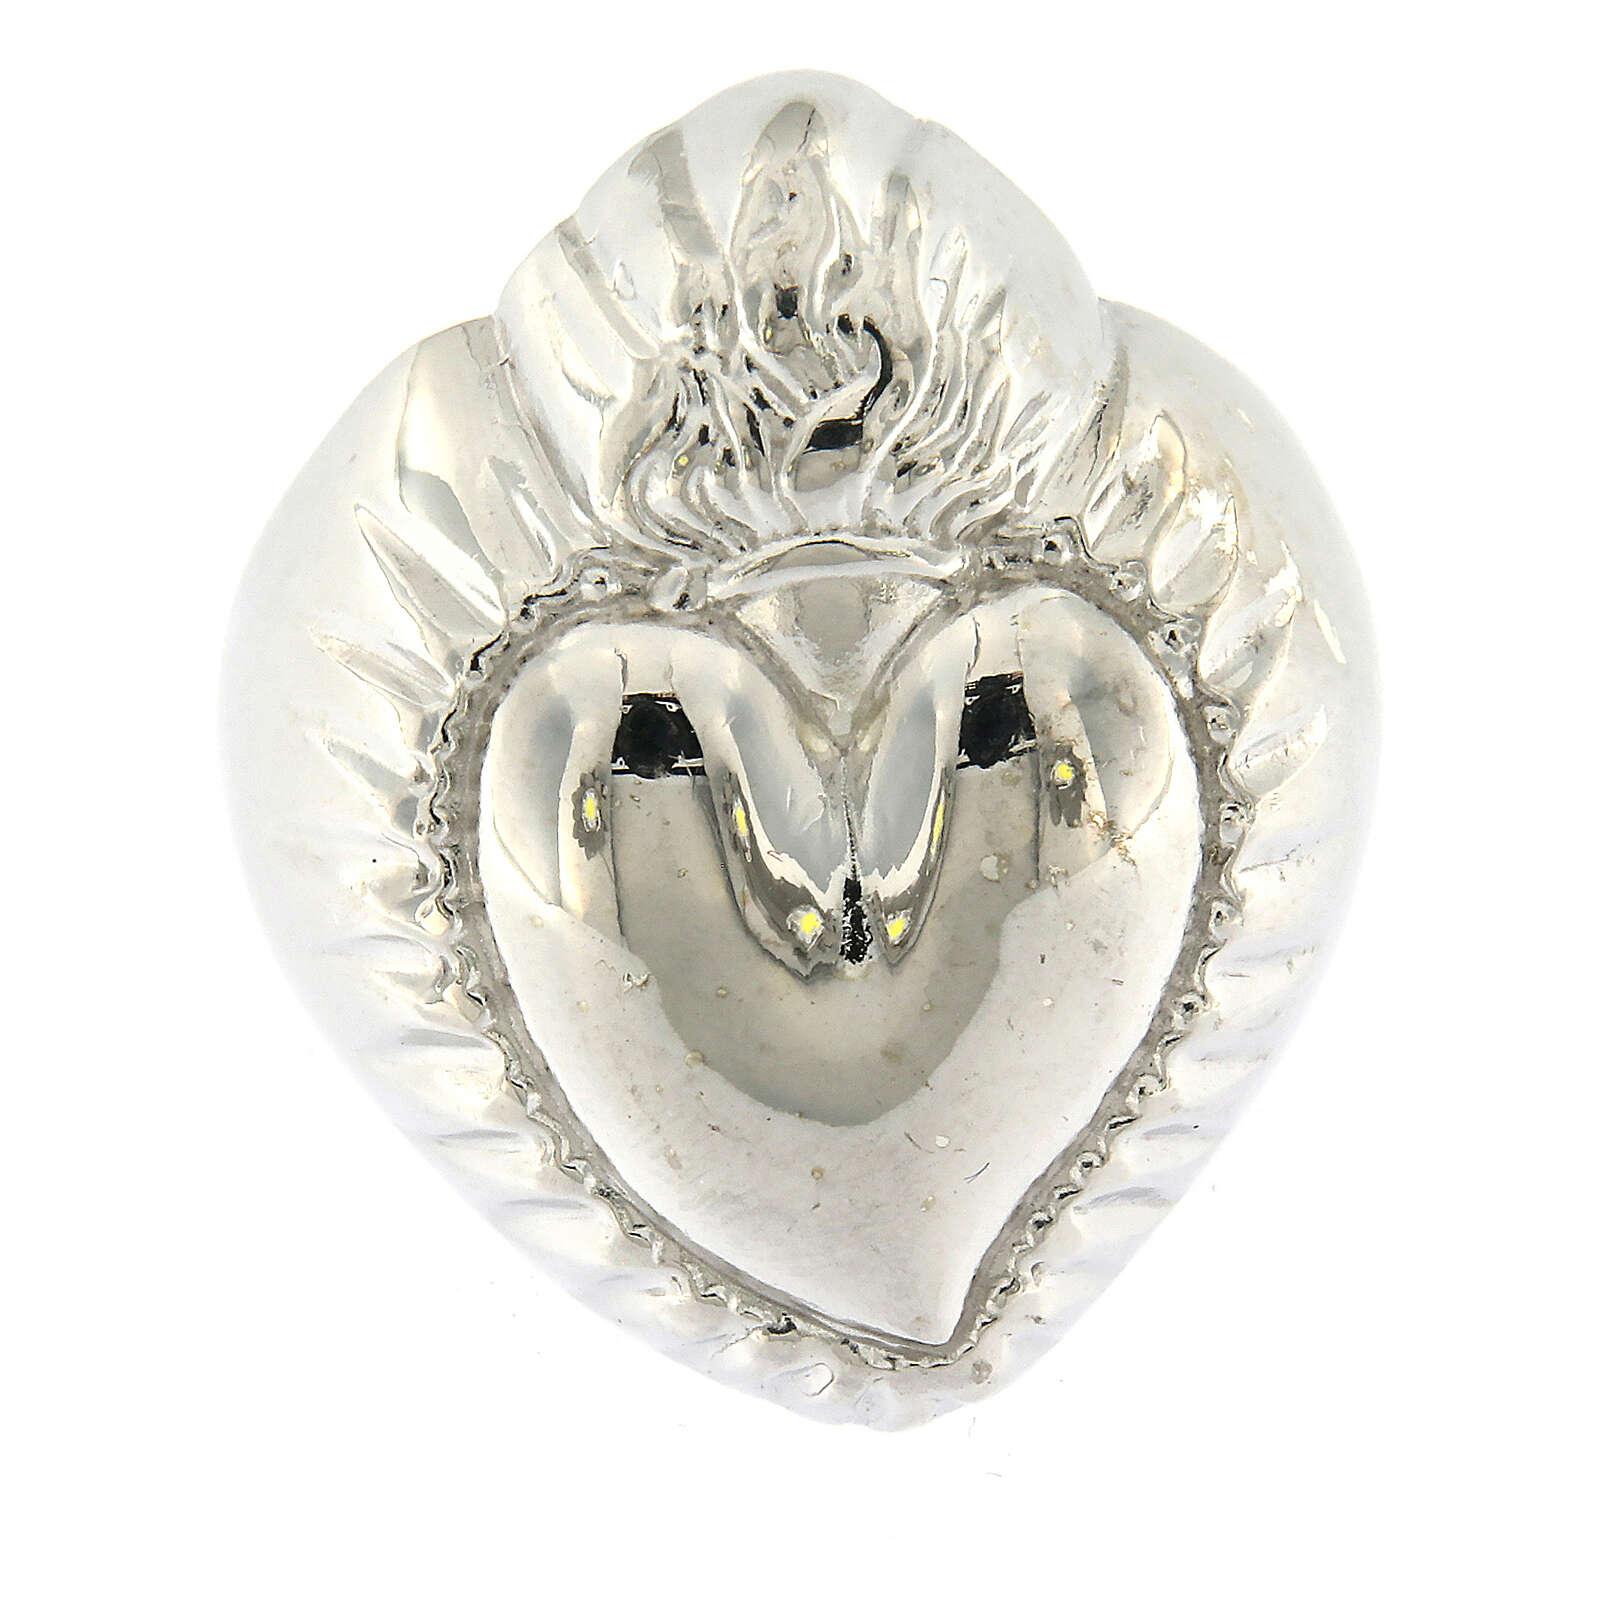 Anillo corazón votivo plata 925 lúcido 20 mm 3